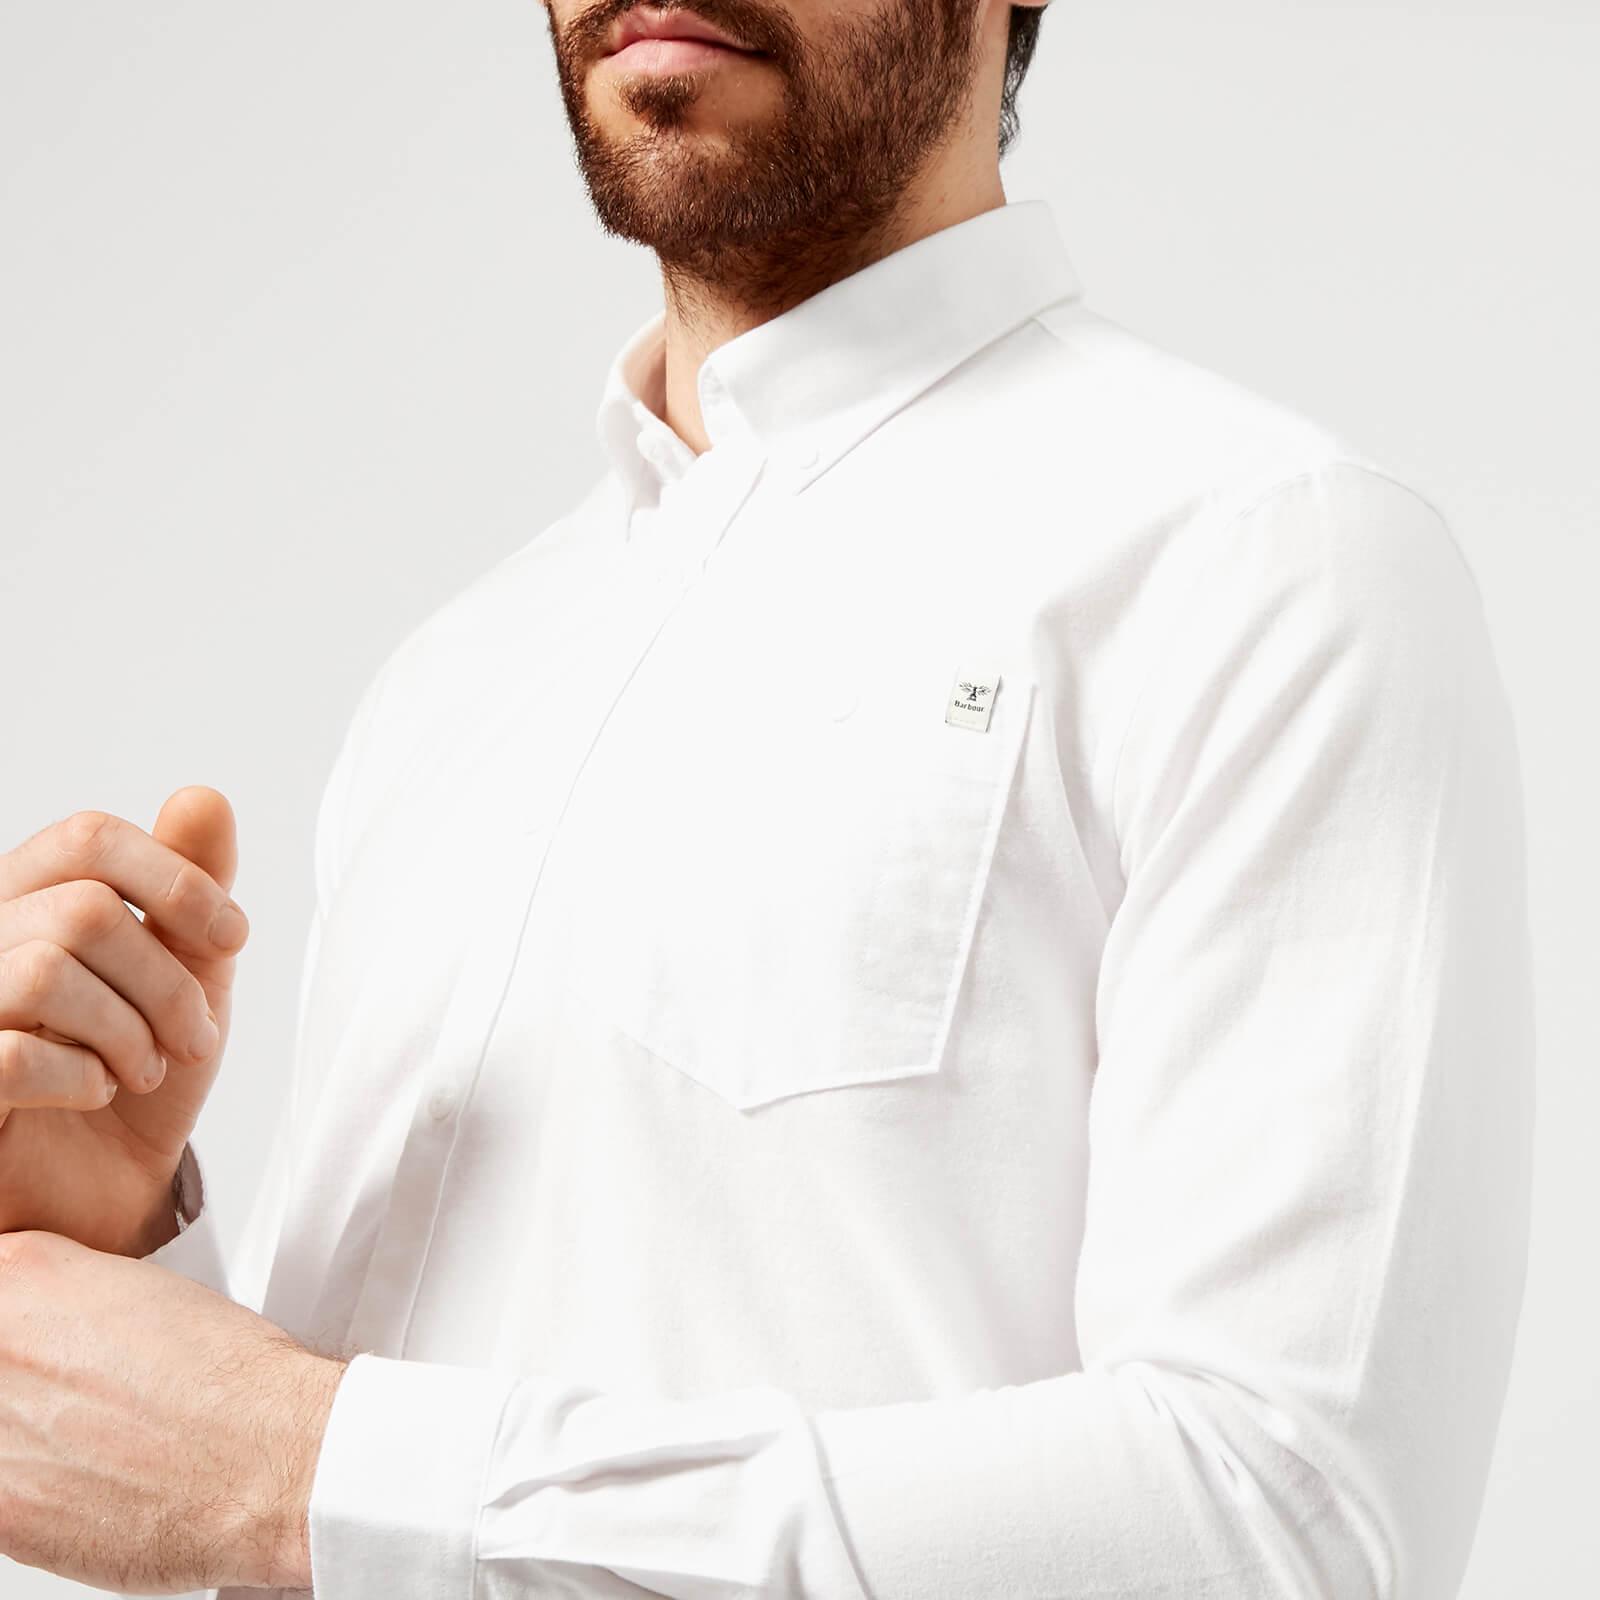 da7a5e28f156 Barbour Heritage Men s Lang Long Sleeve Shirt - White - Free UK ...